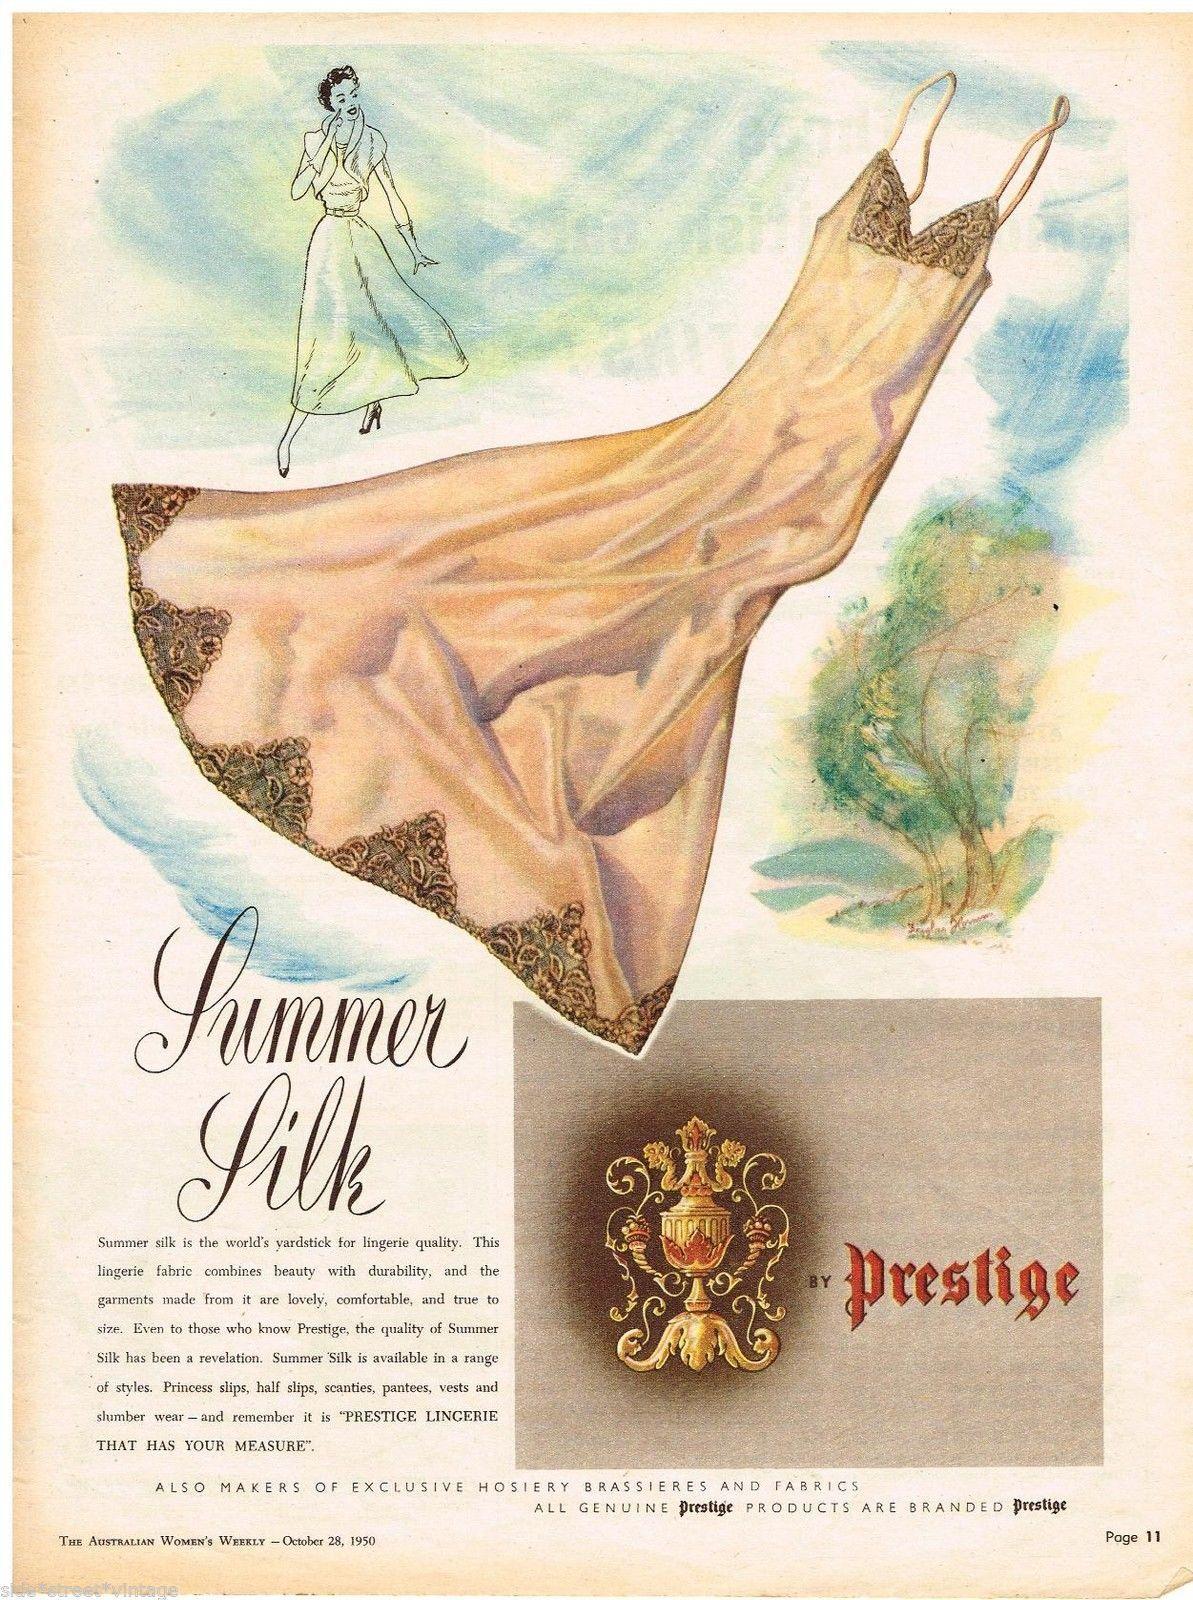 Prestige Lingerie Ad Retro Summer Silk Vintage Advertising 1950 Original Advert | eBay